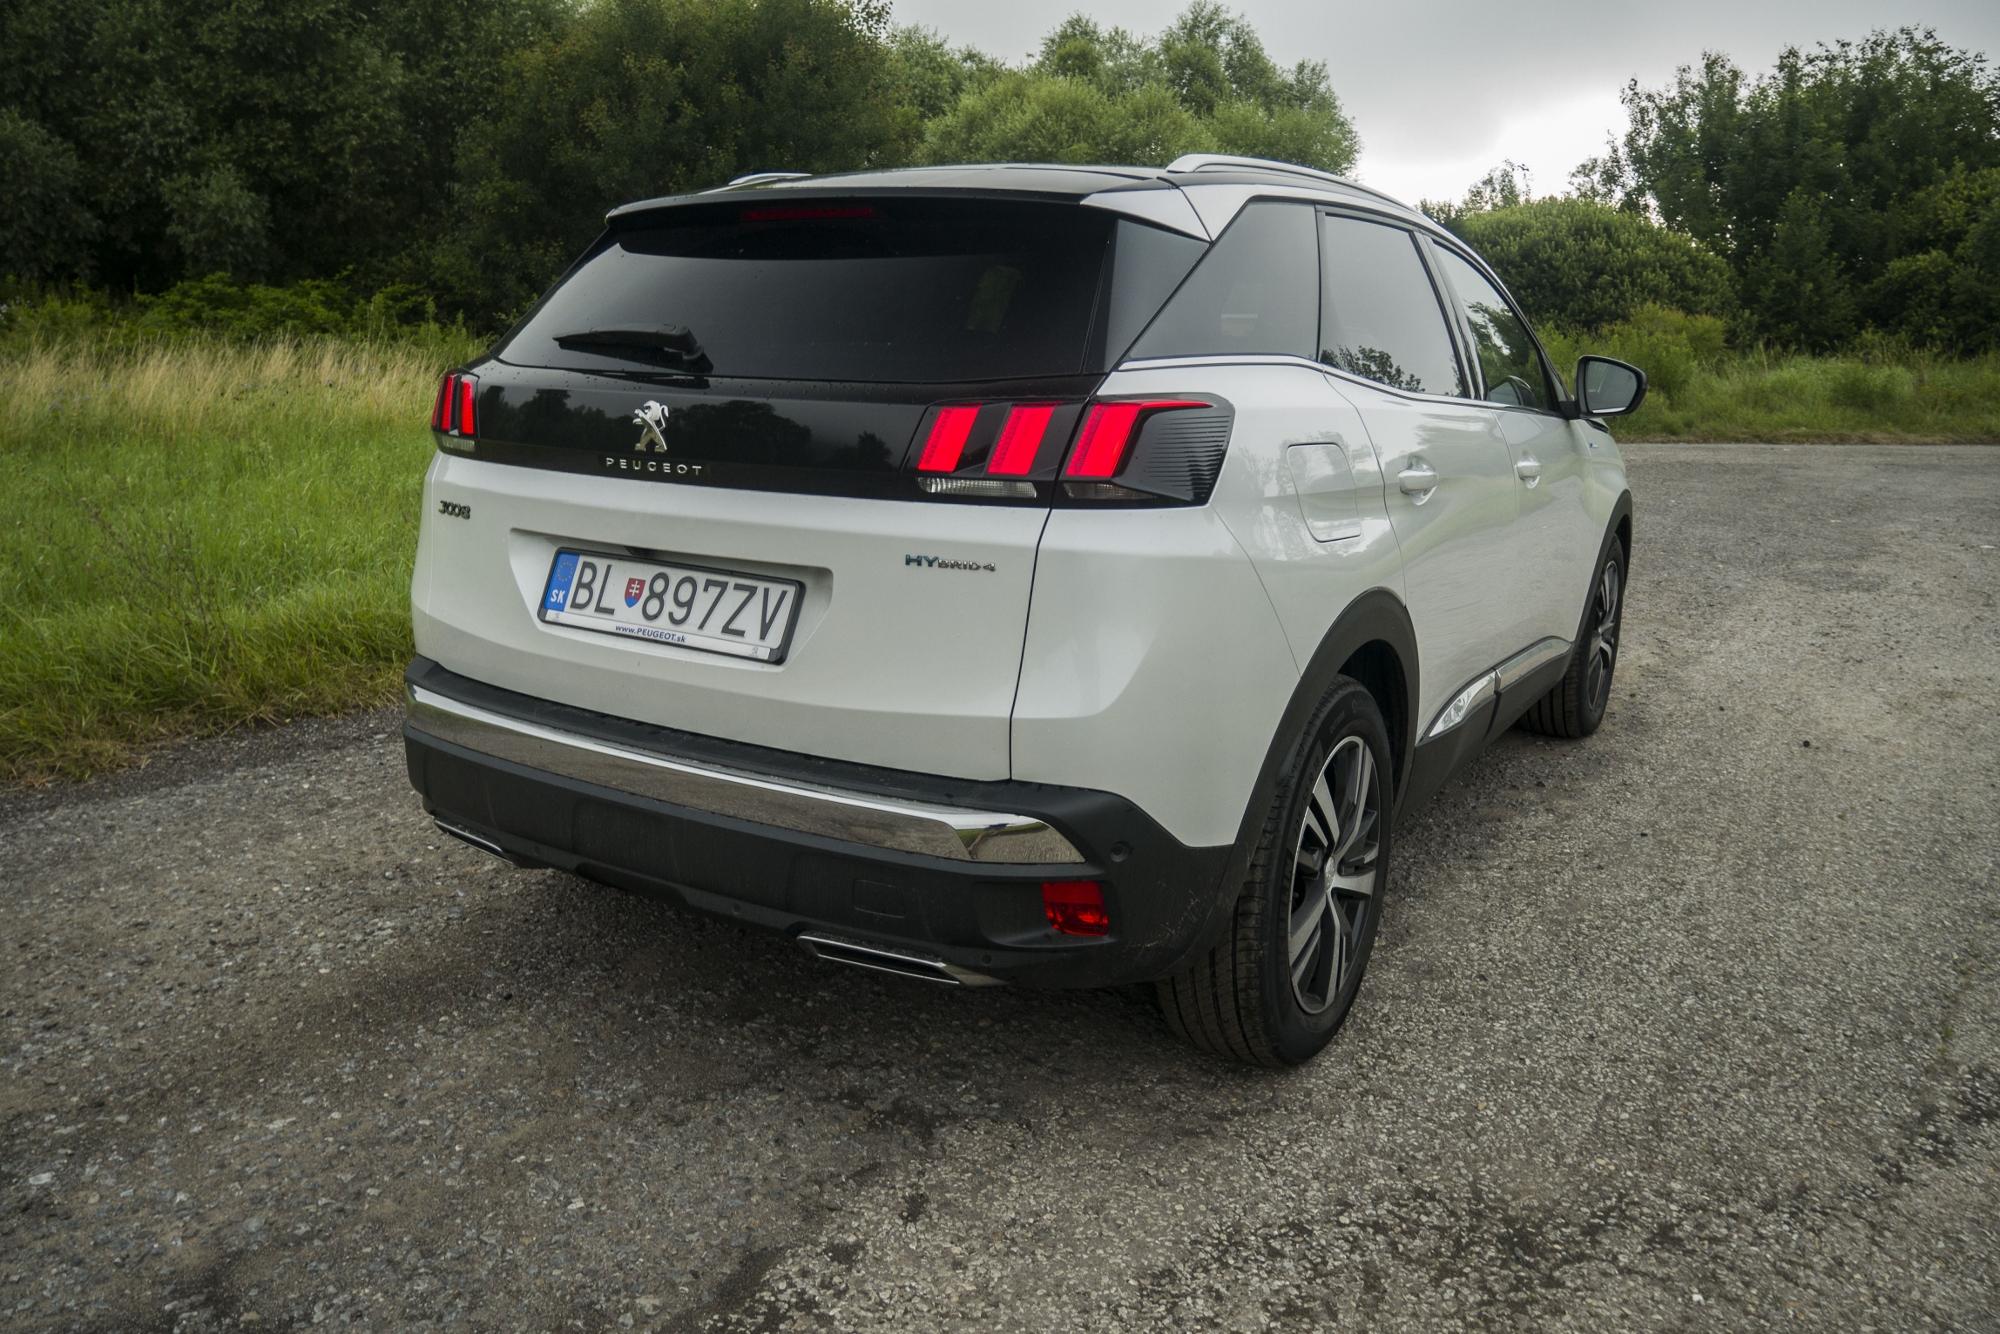 Test: Peugeot 3008 posúva schopnosti plug in hybridov rHKfCWBu0X peugeot-3008-hybrid4-17